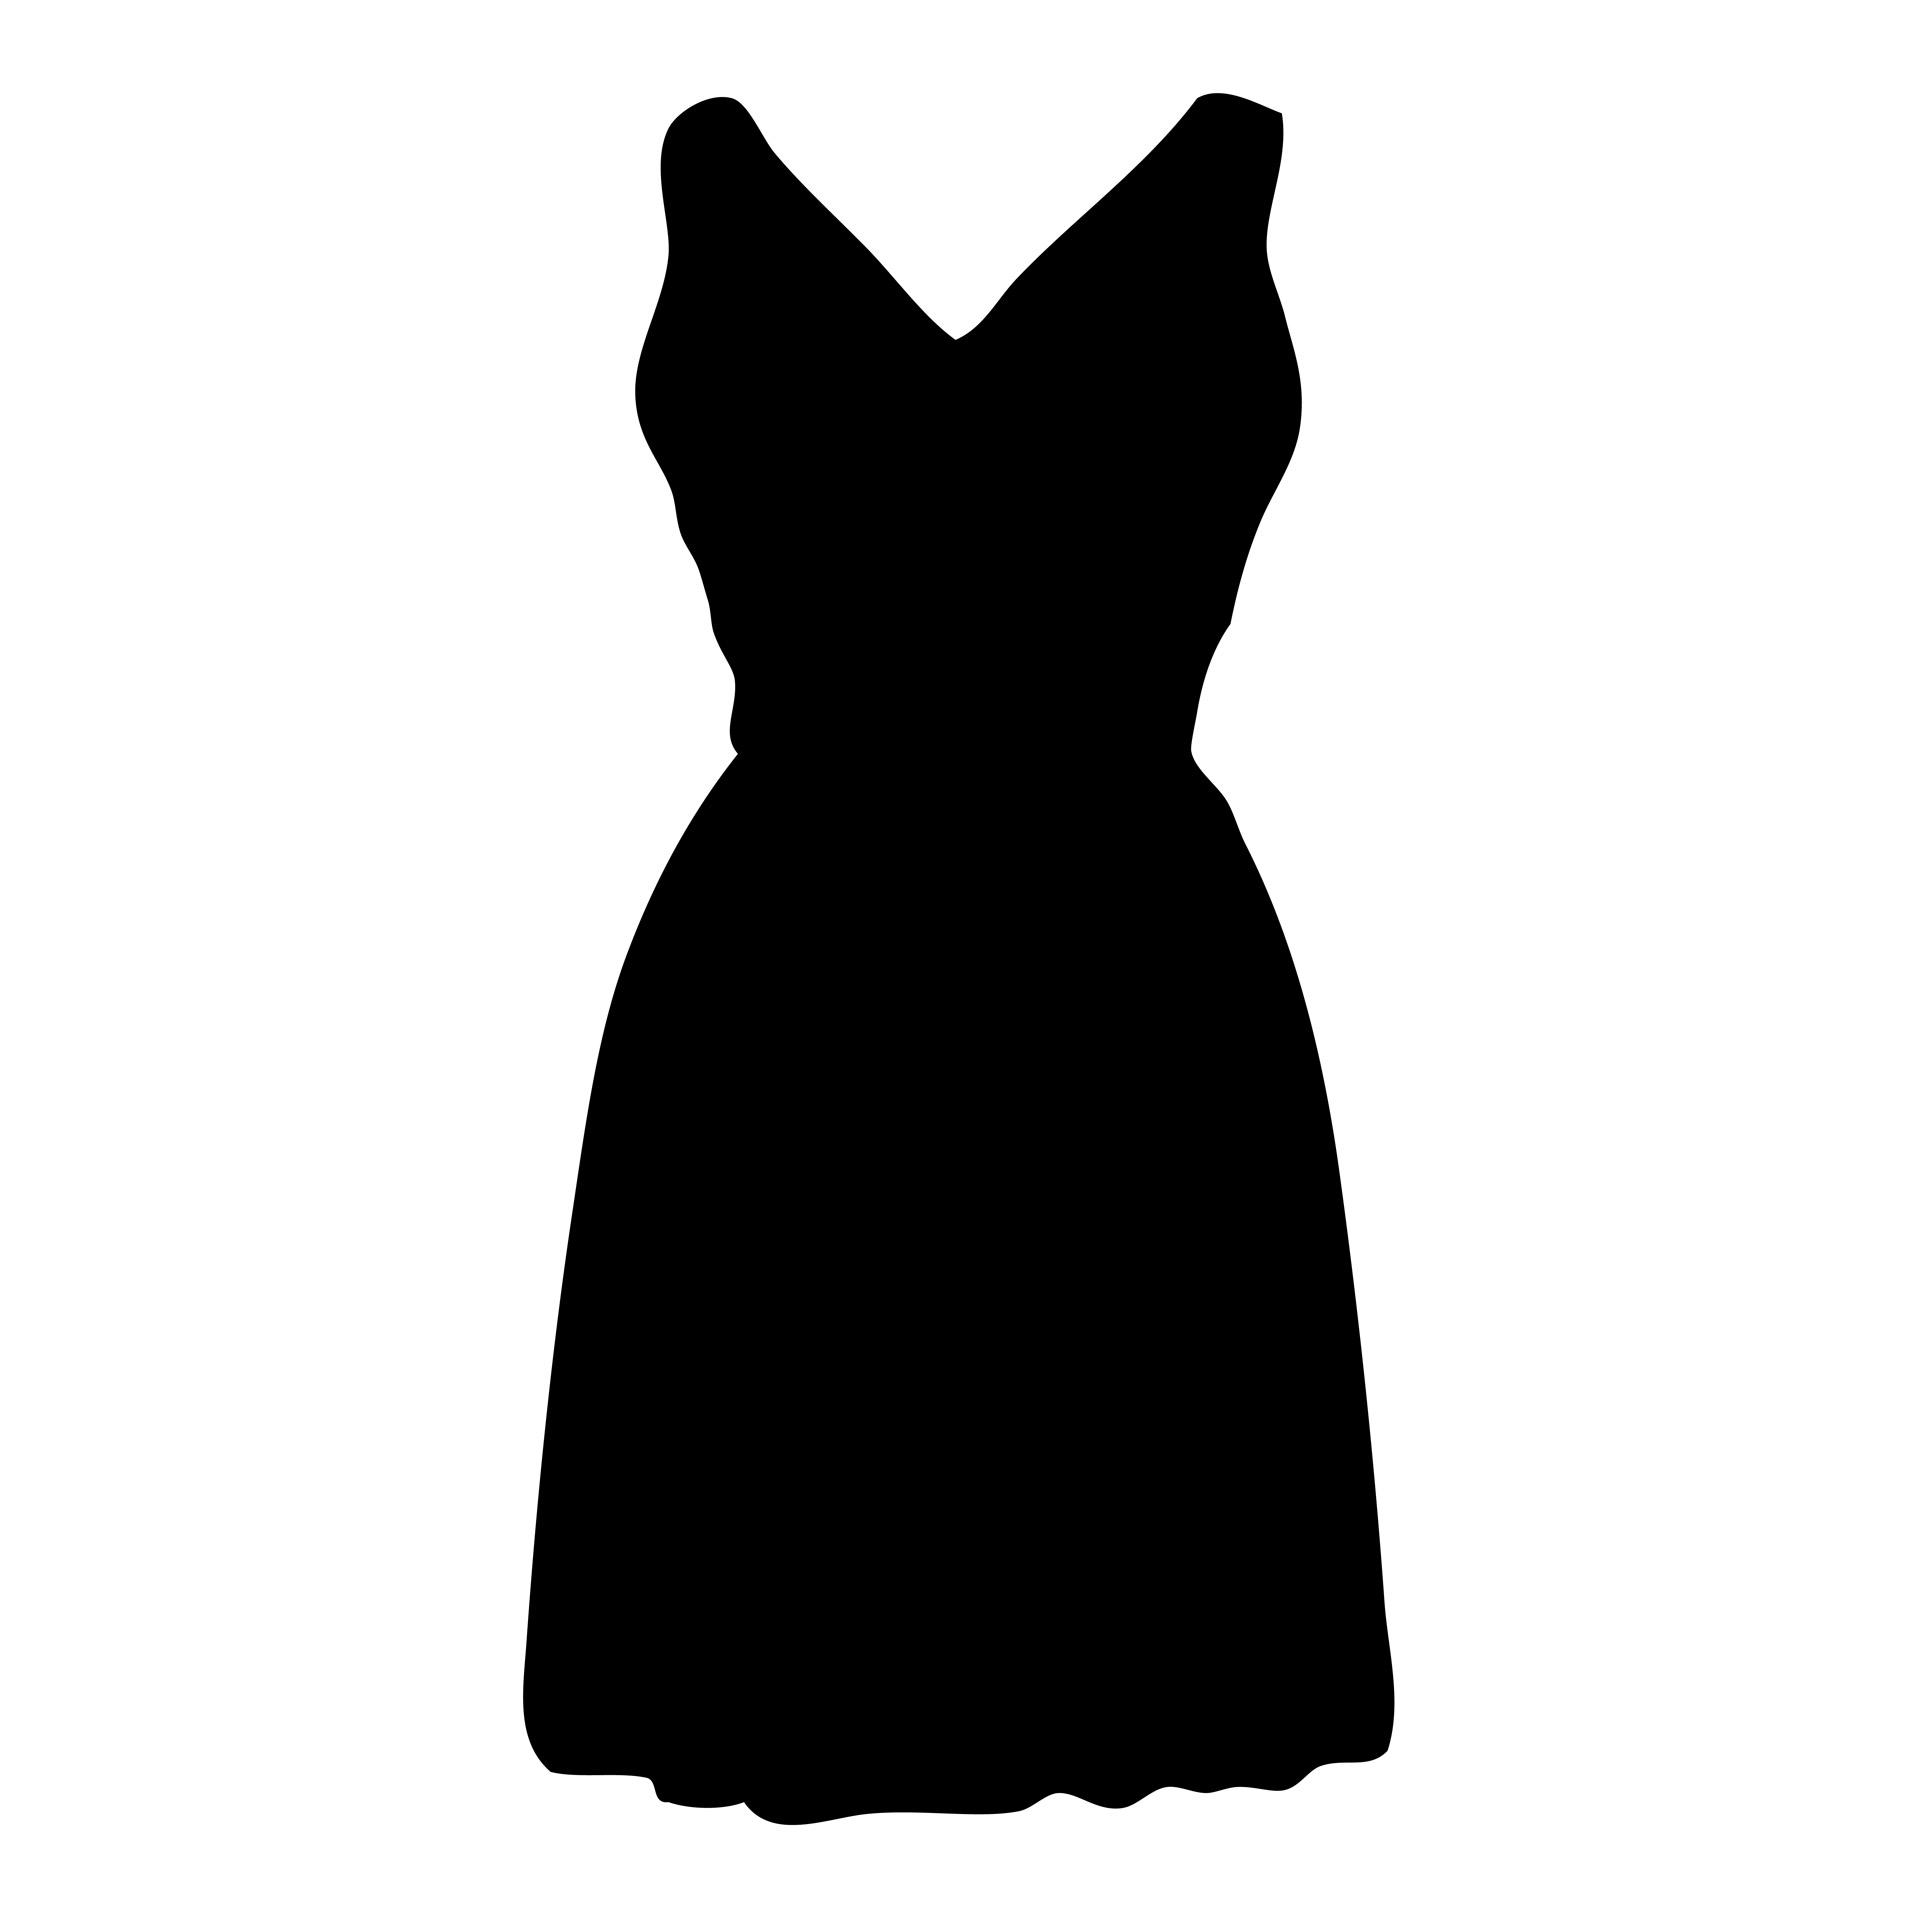 Dress clipart filipino 1 Clip Art Public Dress